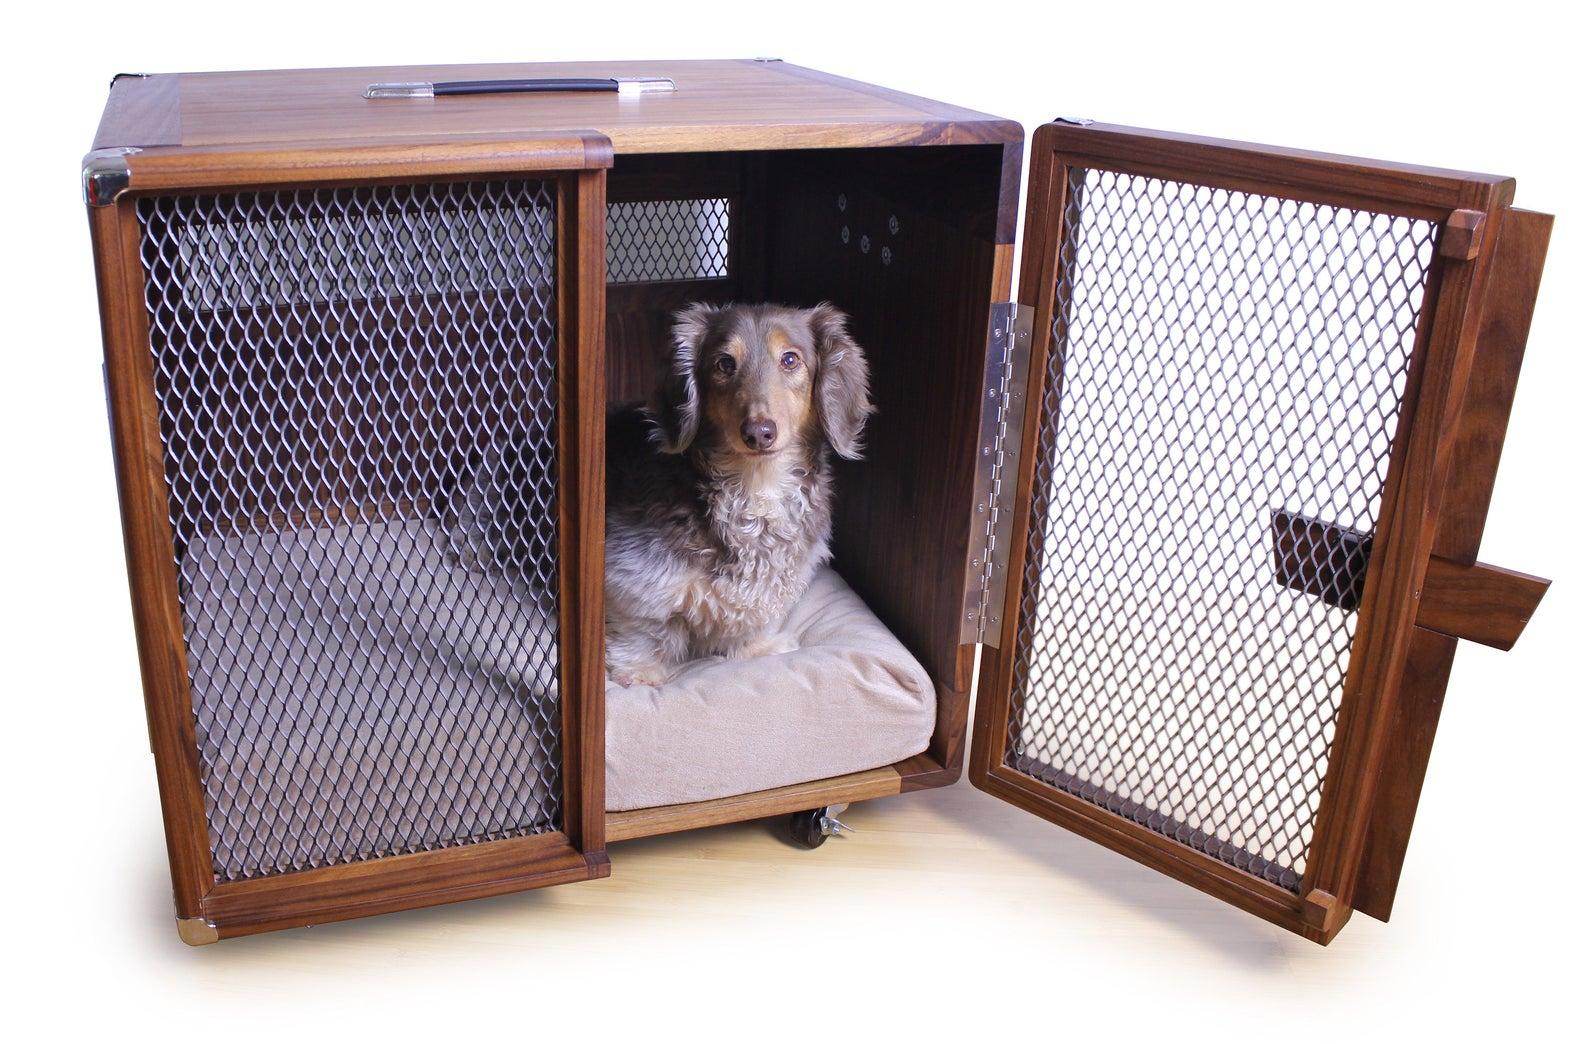 Fullertone Custom Dog Kennel Inspired by Vintage Guitar Amp via Piazza Design (Etsy)